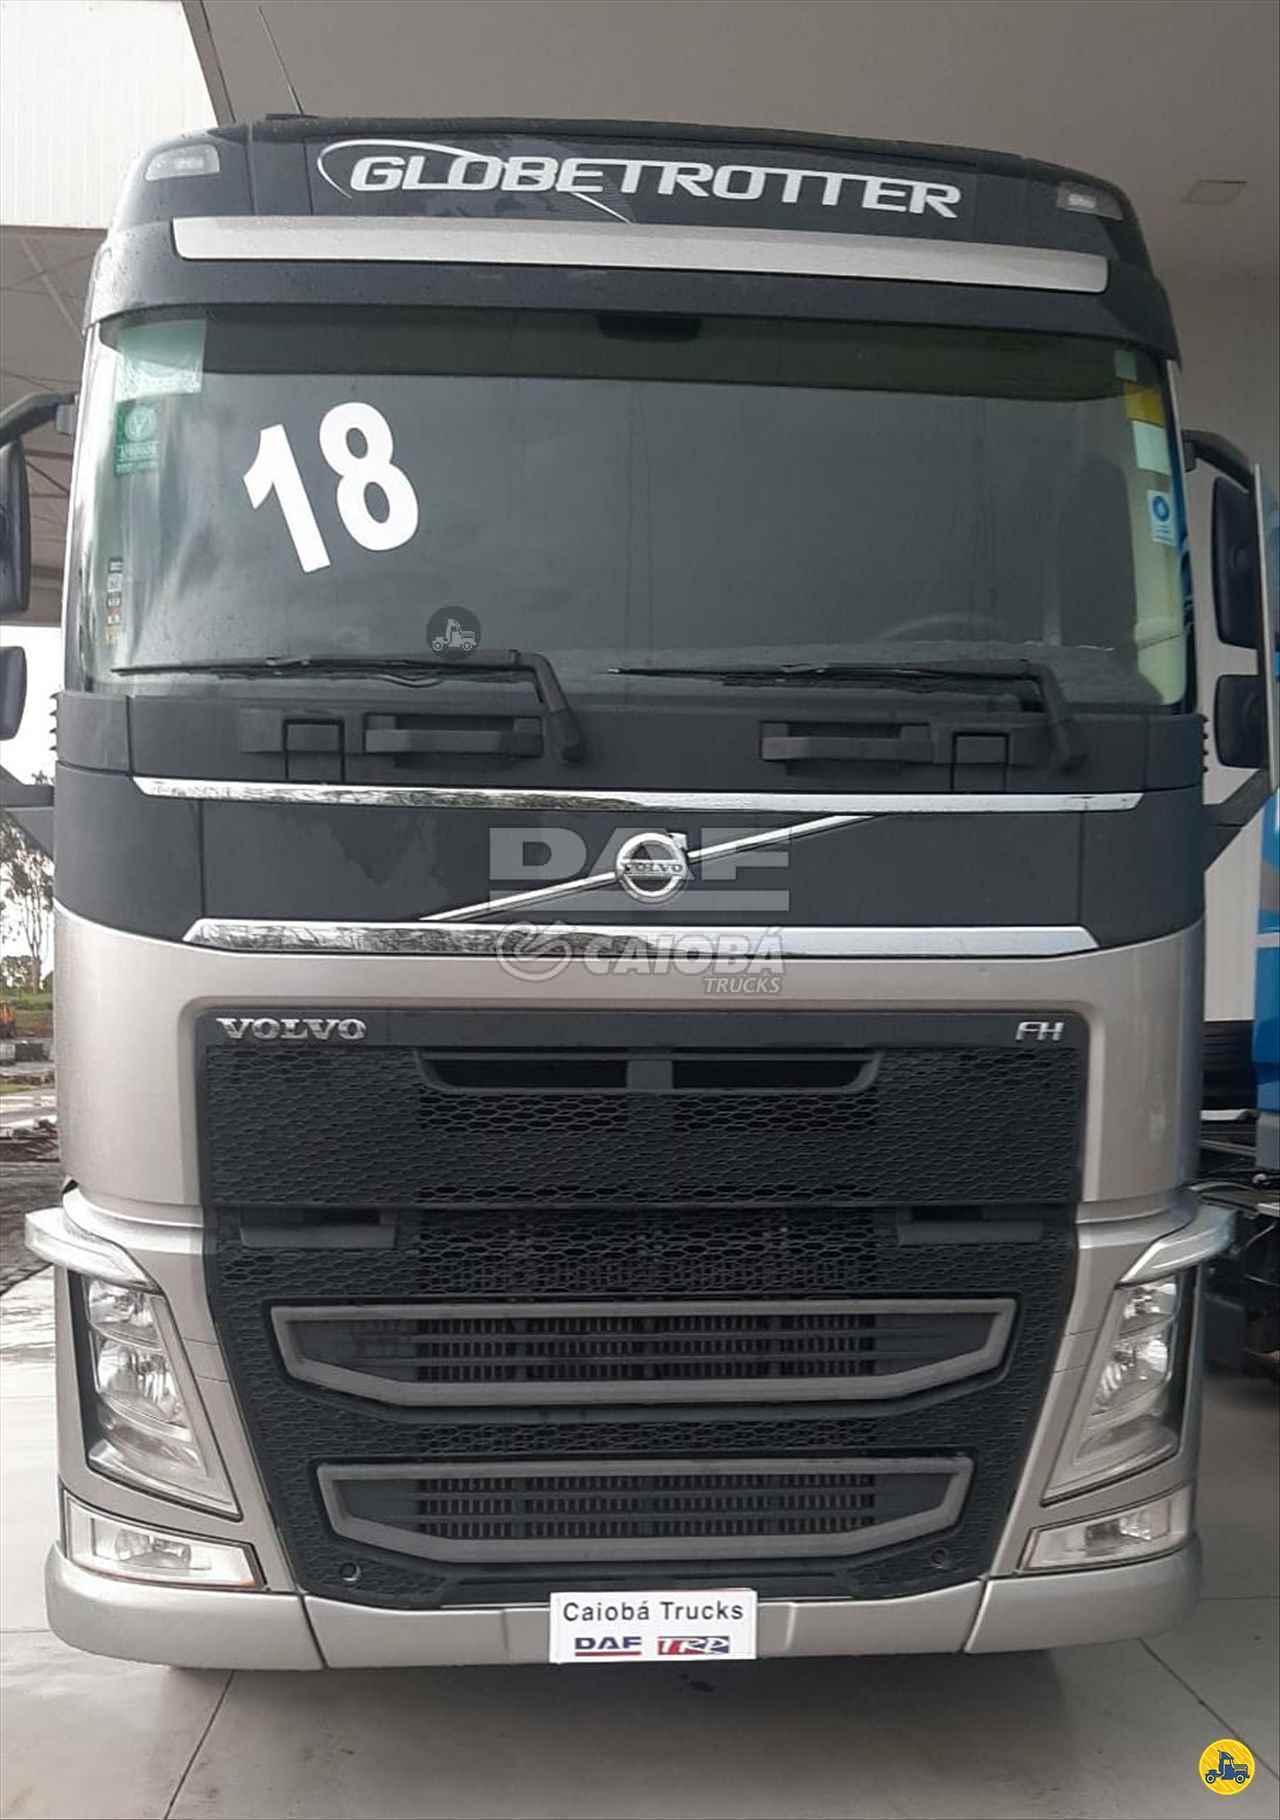 CAMINHAO VOLVO VOLVO FH 460 Cavalo Mecânico Truck 6x2 Caiobá Trucks - DAF CAMPO GRANDE MATO GROSSO DO SUL MS